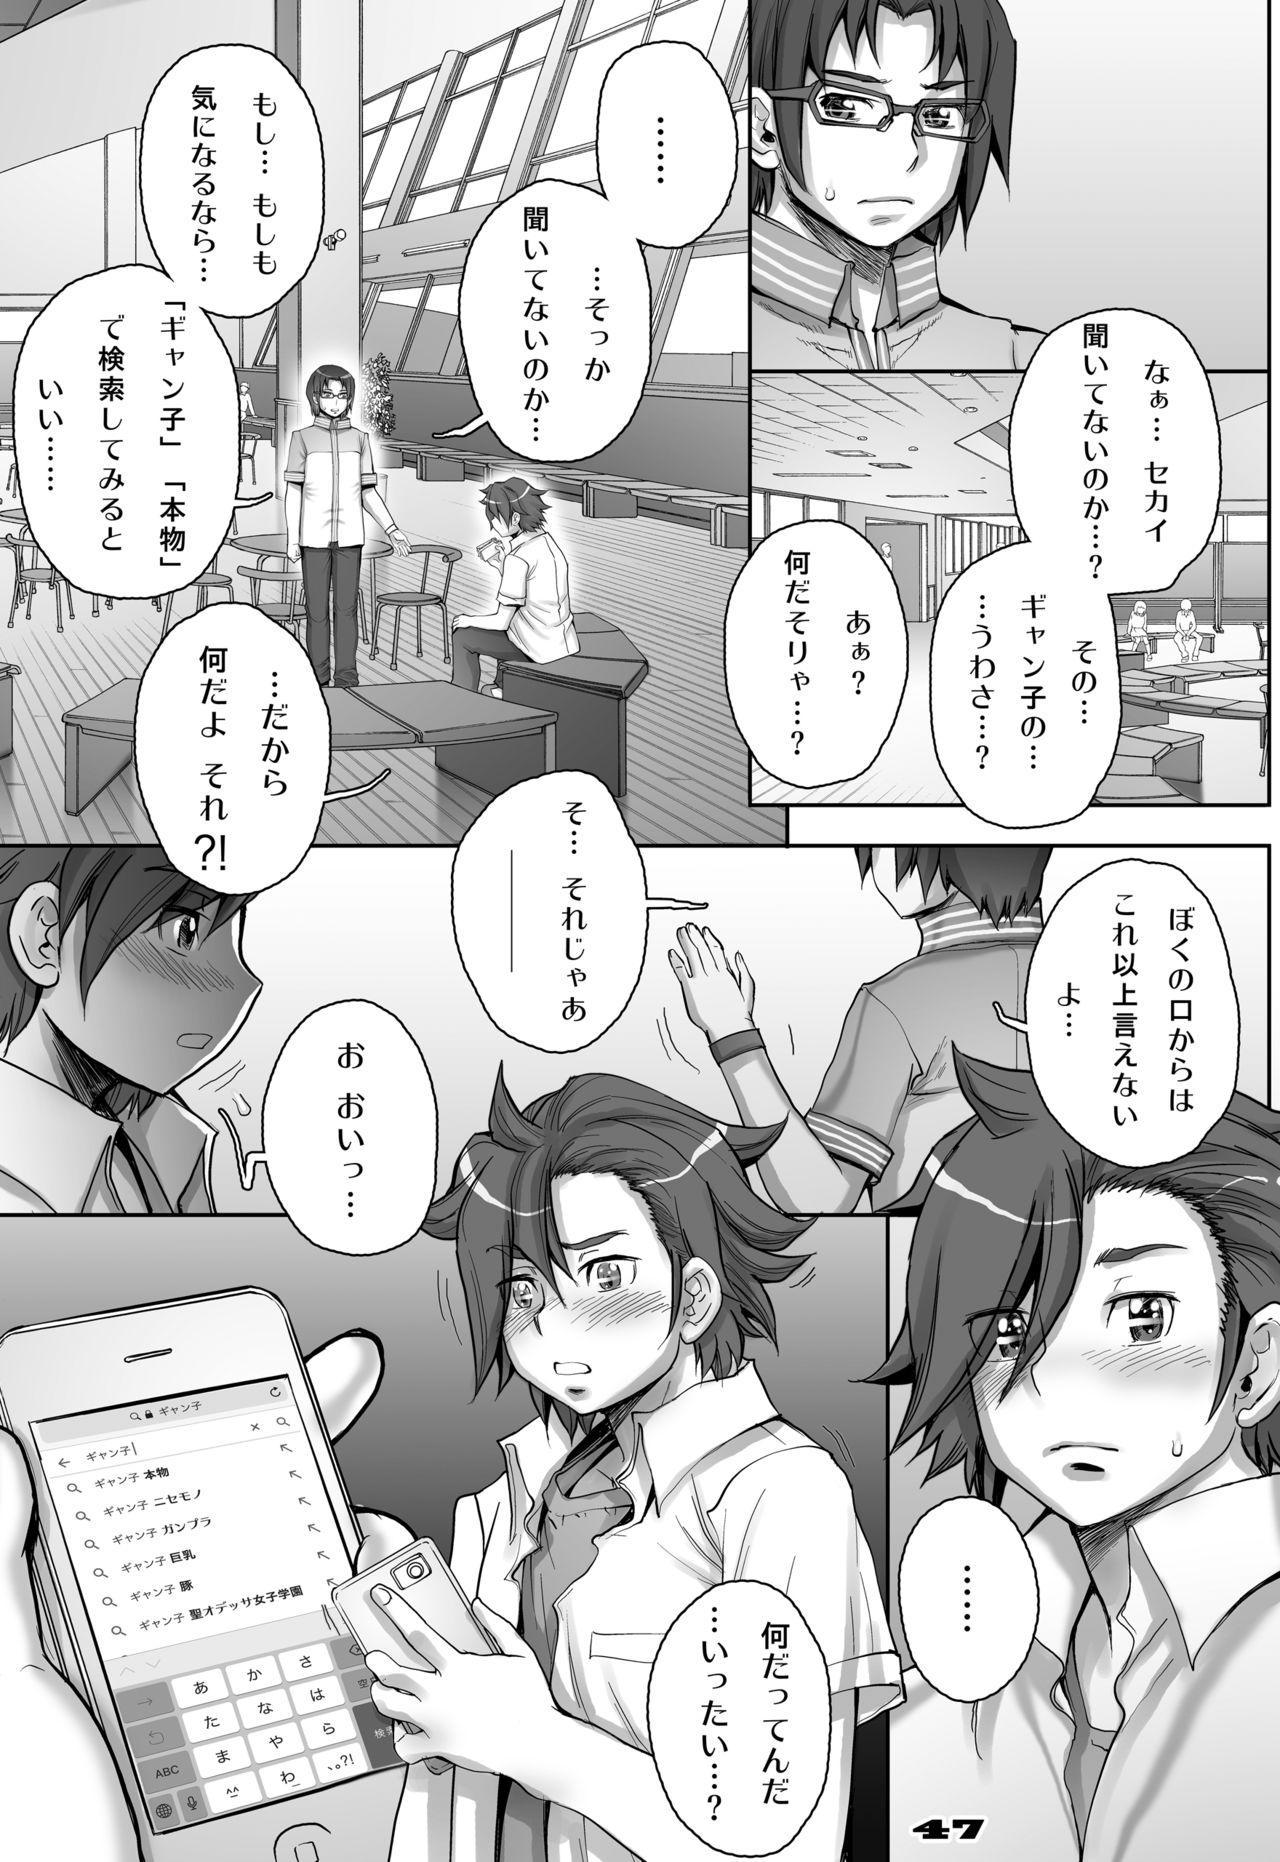 [Studio Tapa Tapa (Sengoku-kun)] Daddy-Long-Legs #2 (Gundam Build Fighters Try) [Digital] 46